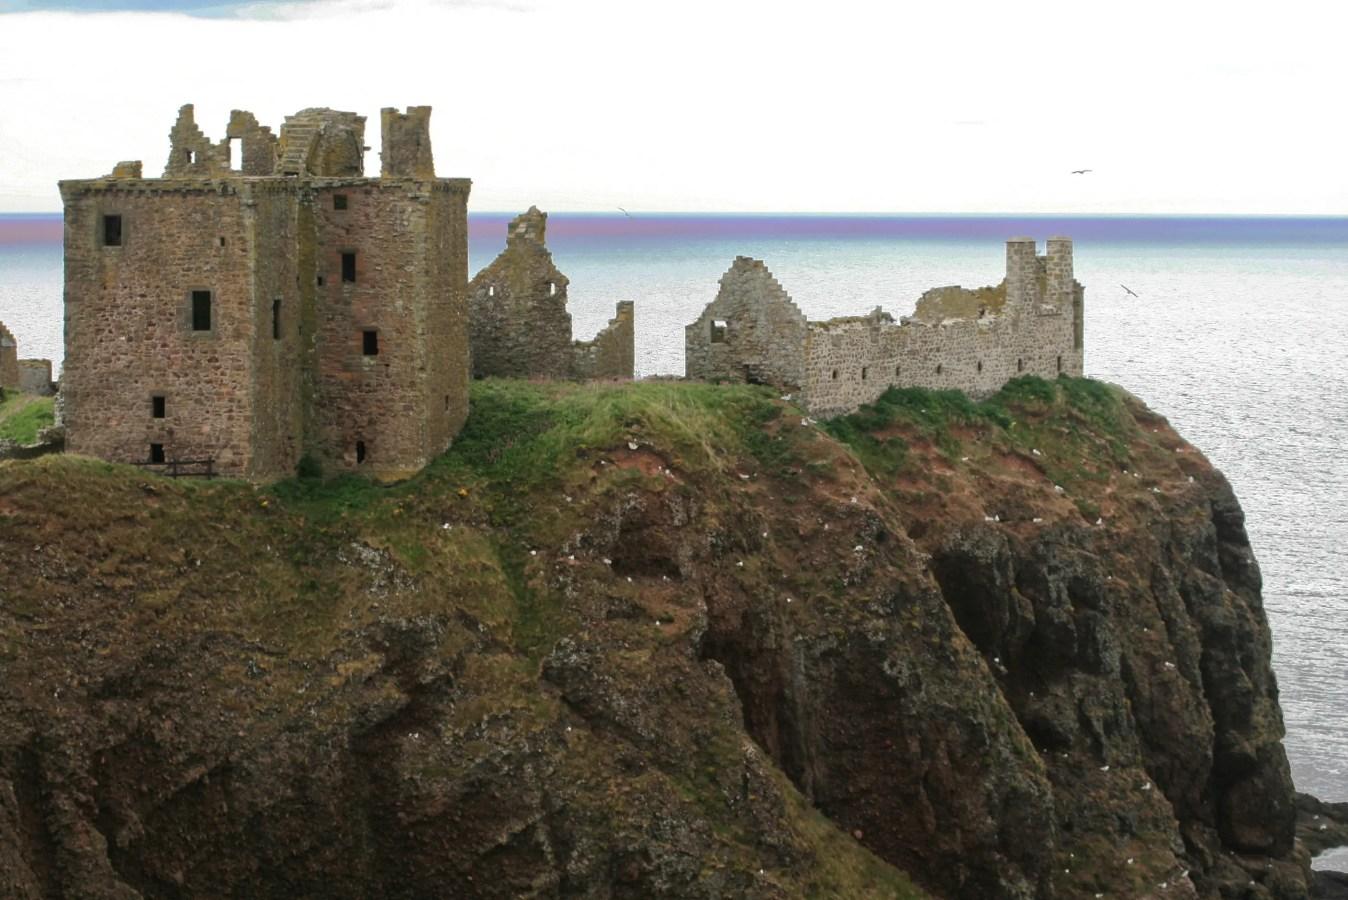 Gruselige Burgen in Schottland, schottische Geisterburgen, Burgruinen Schottland